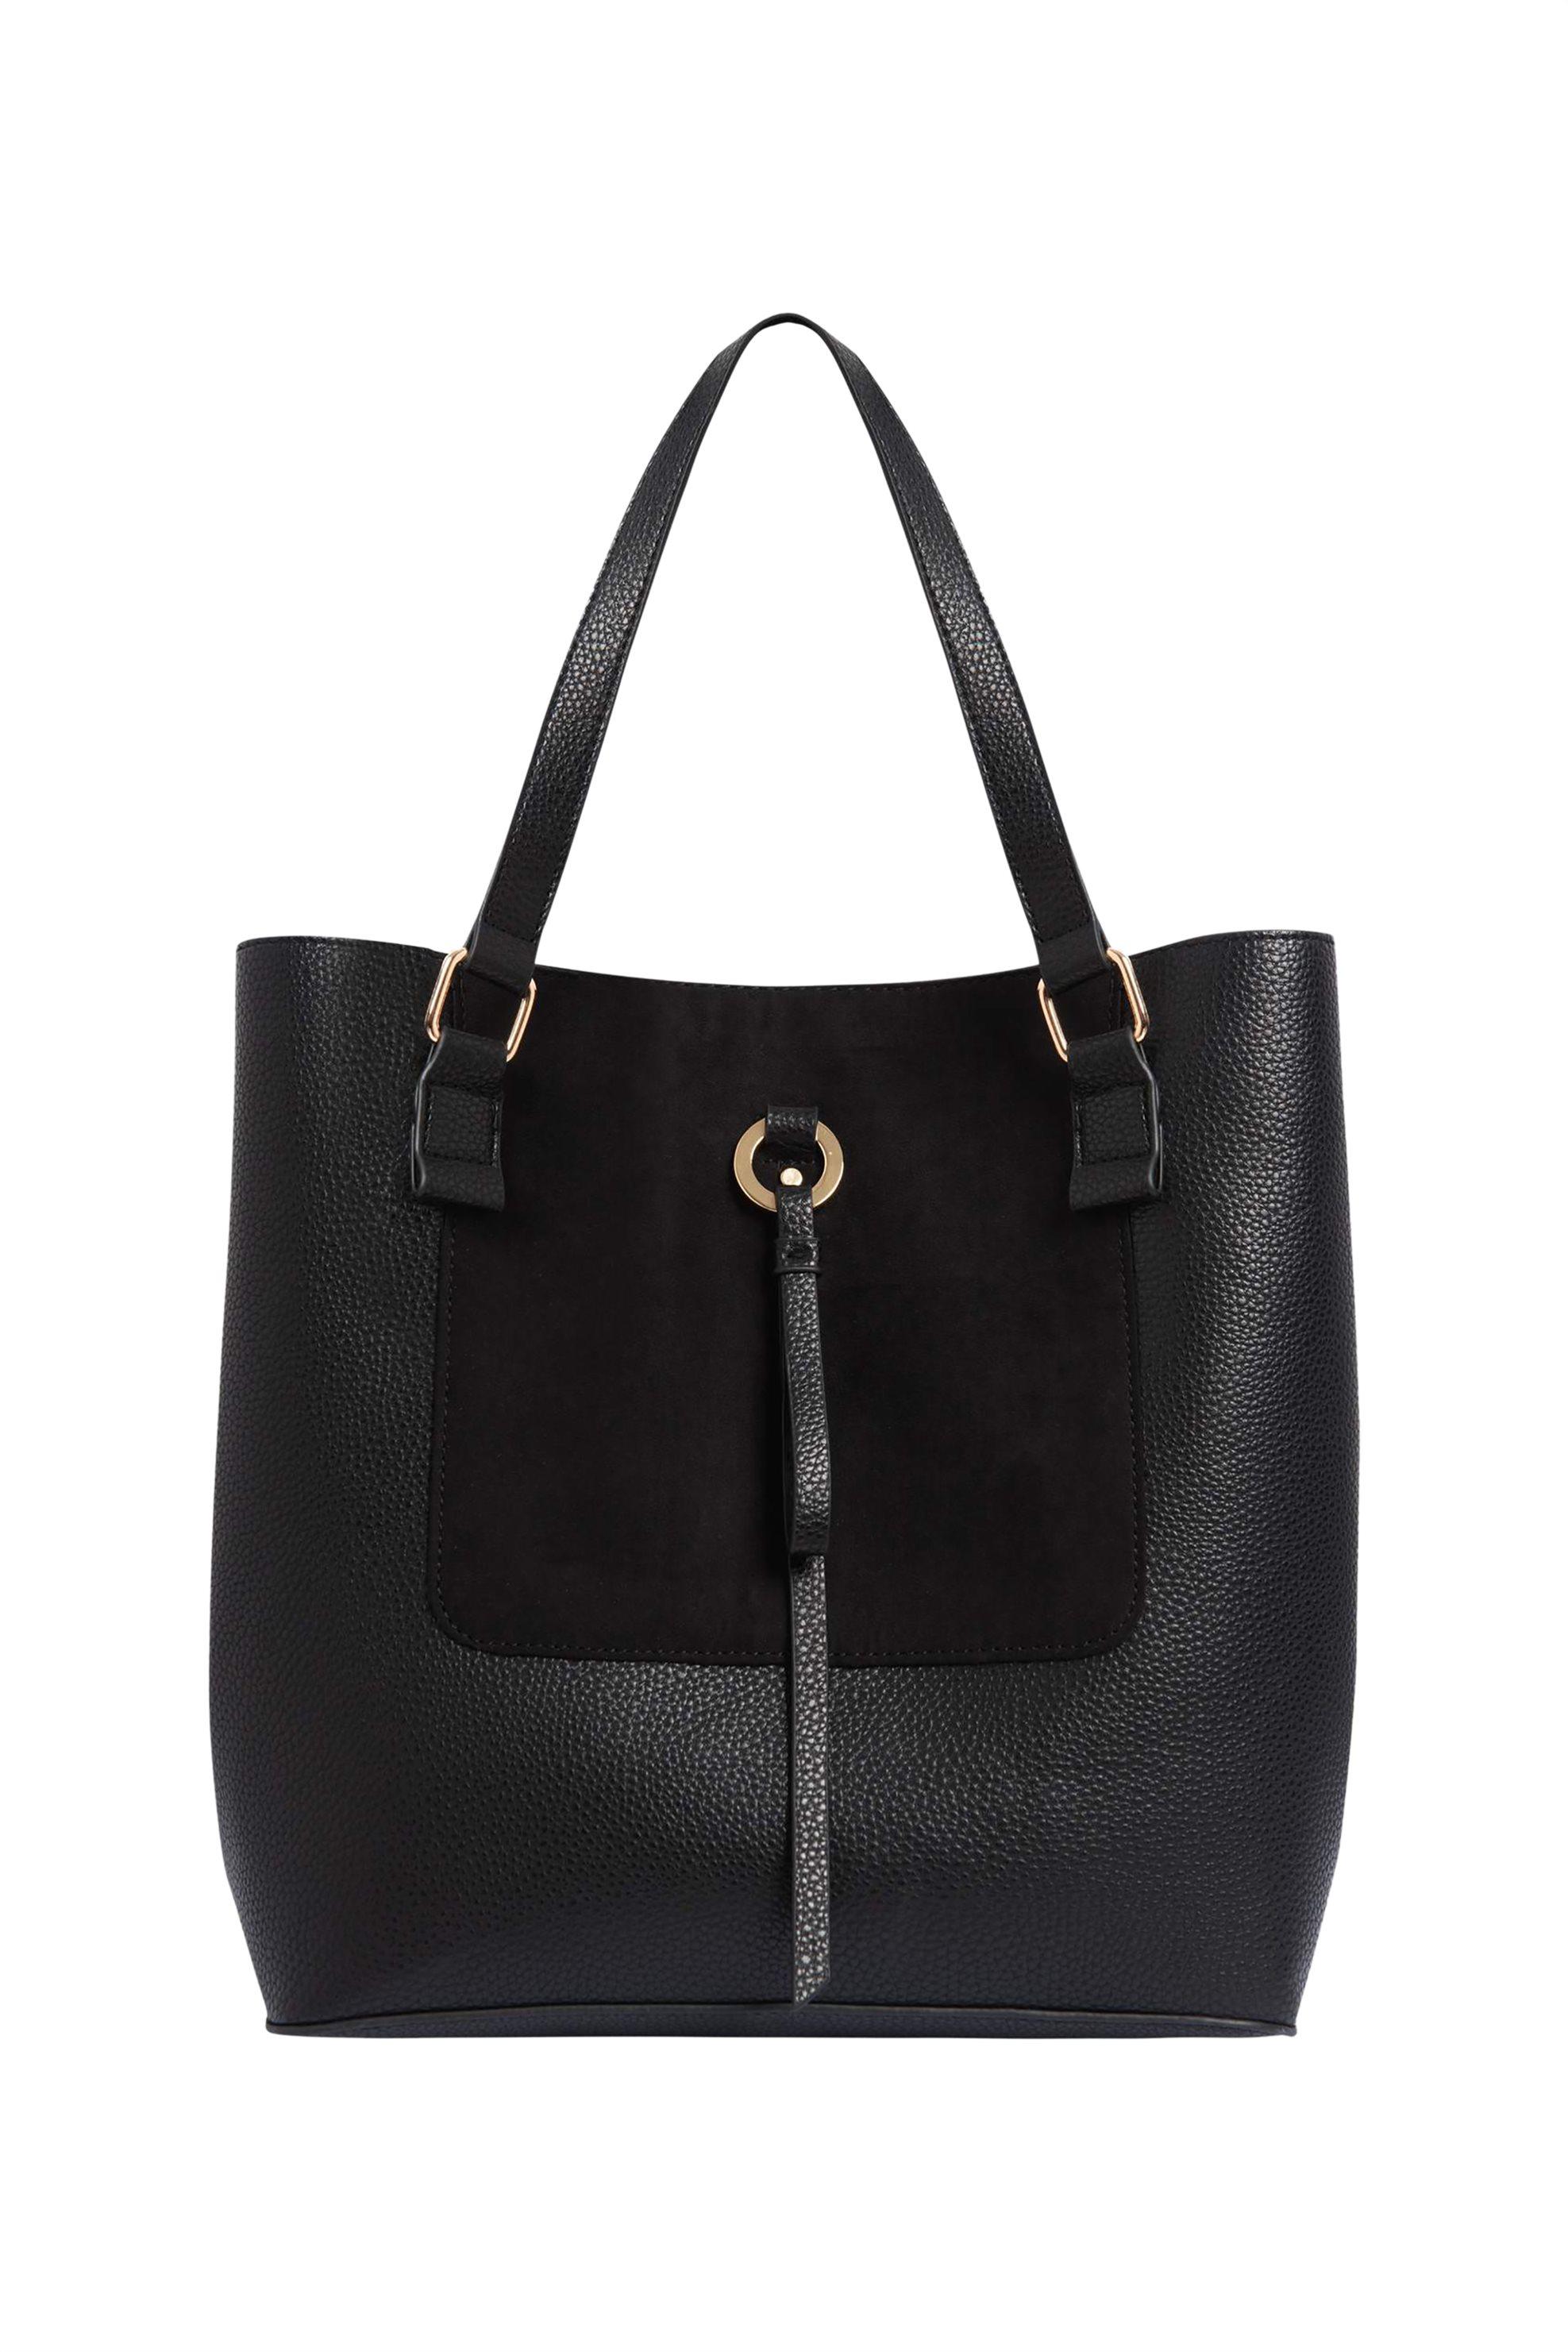 Orsay γυναικεία τσάντα ωμού με suede λεπτομέρεια - 905111-660000 - Μαύρο γυναικα   τσαντεσ   ώμου   shopper bags